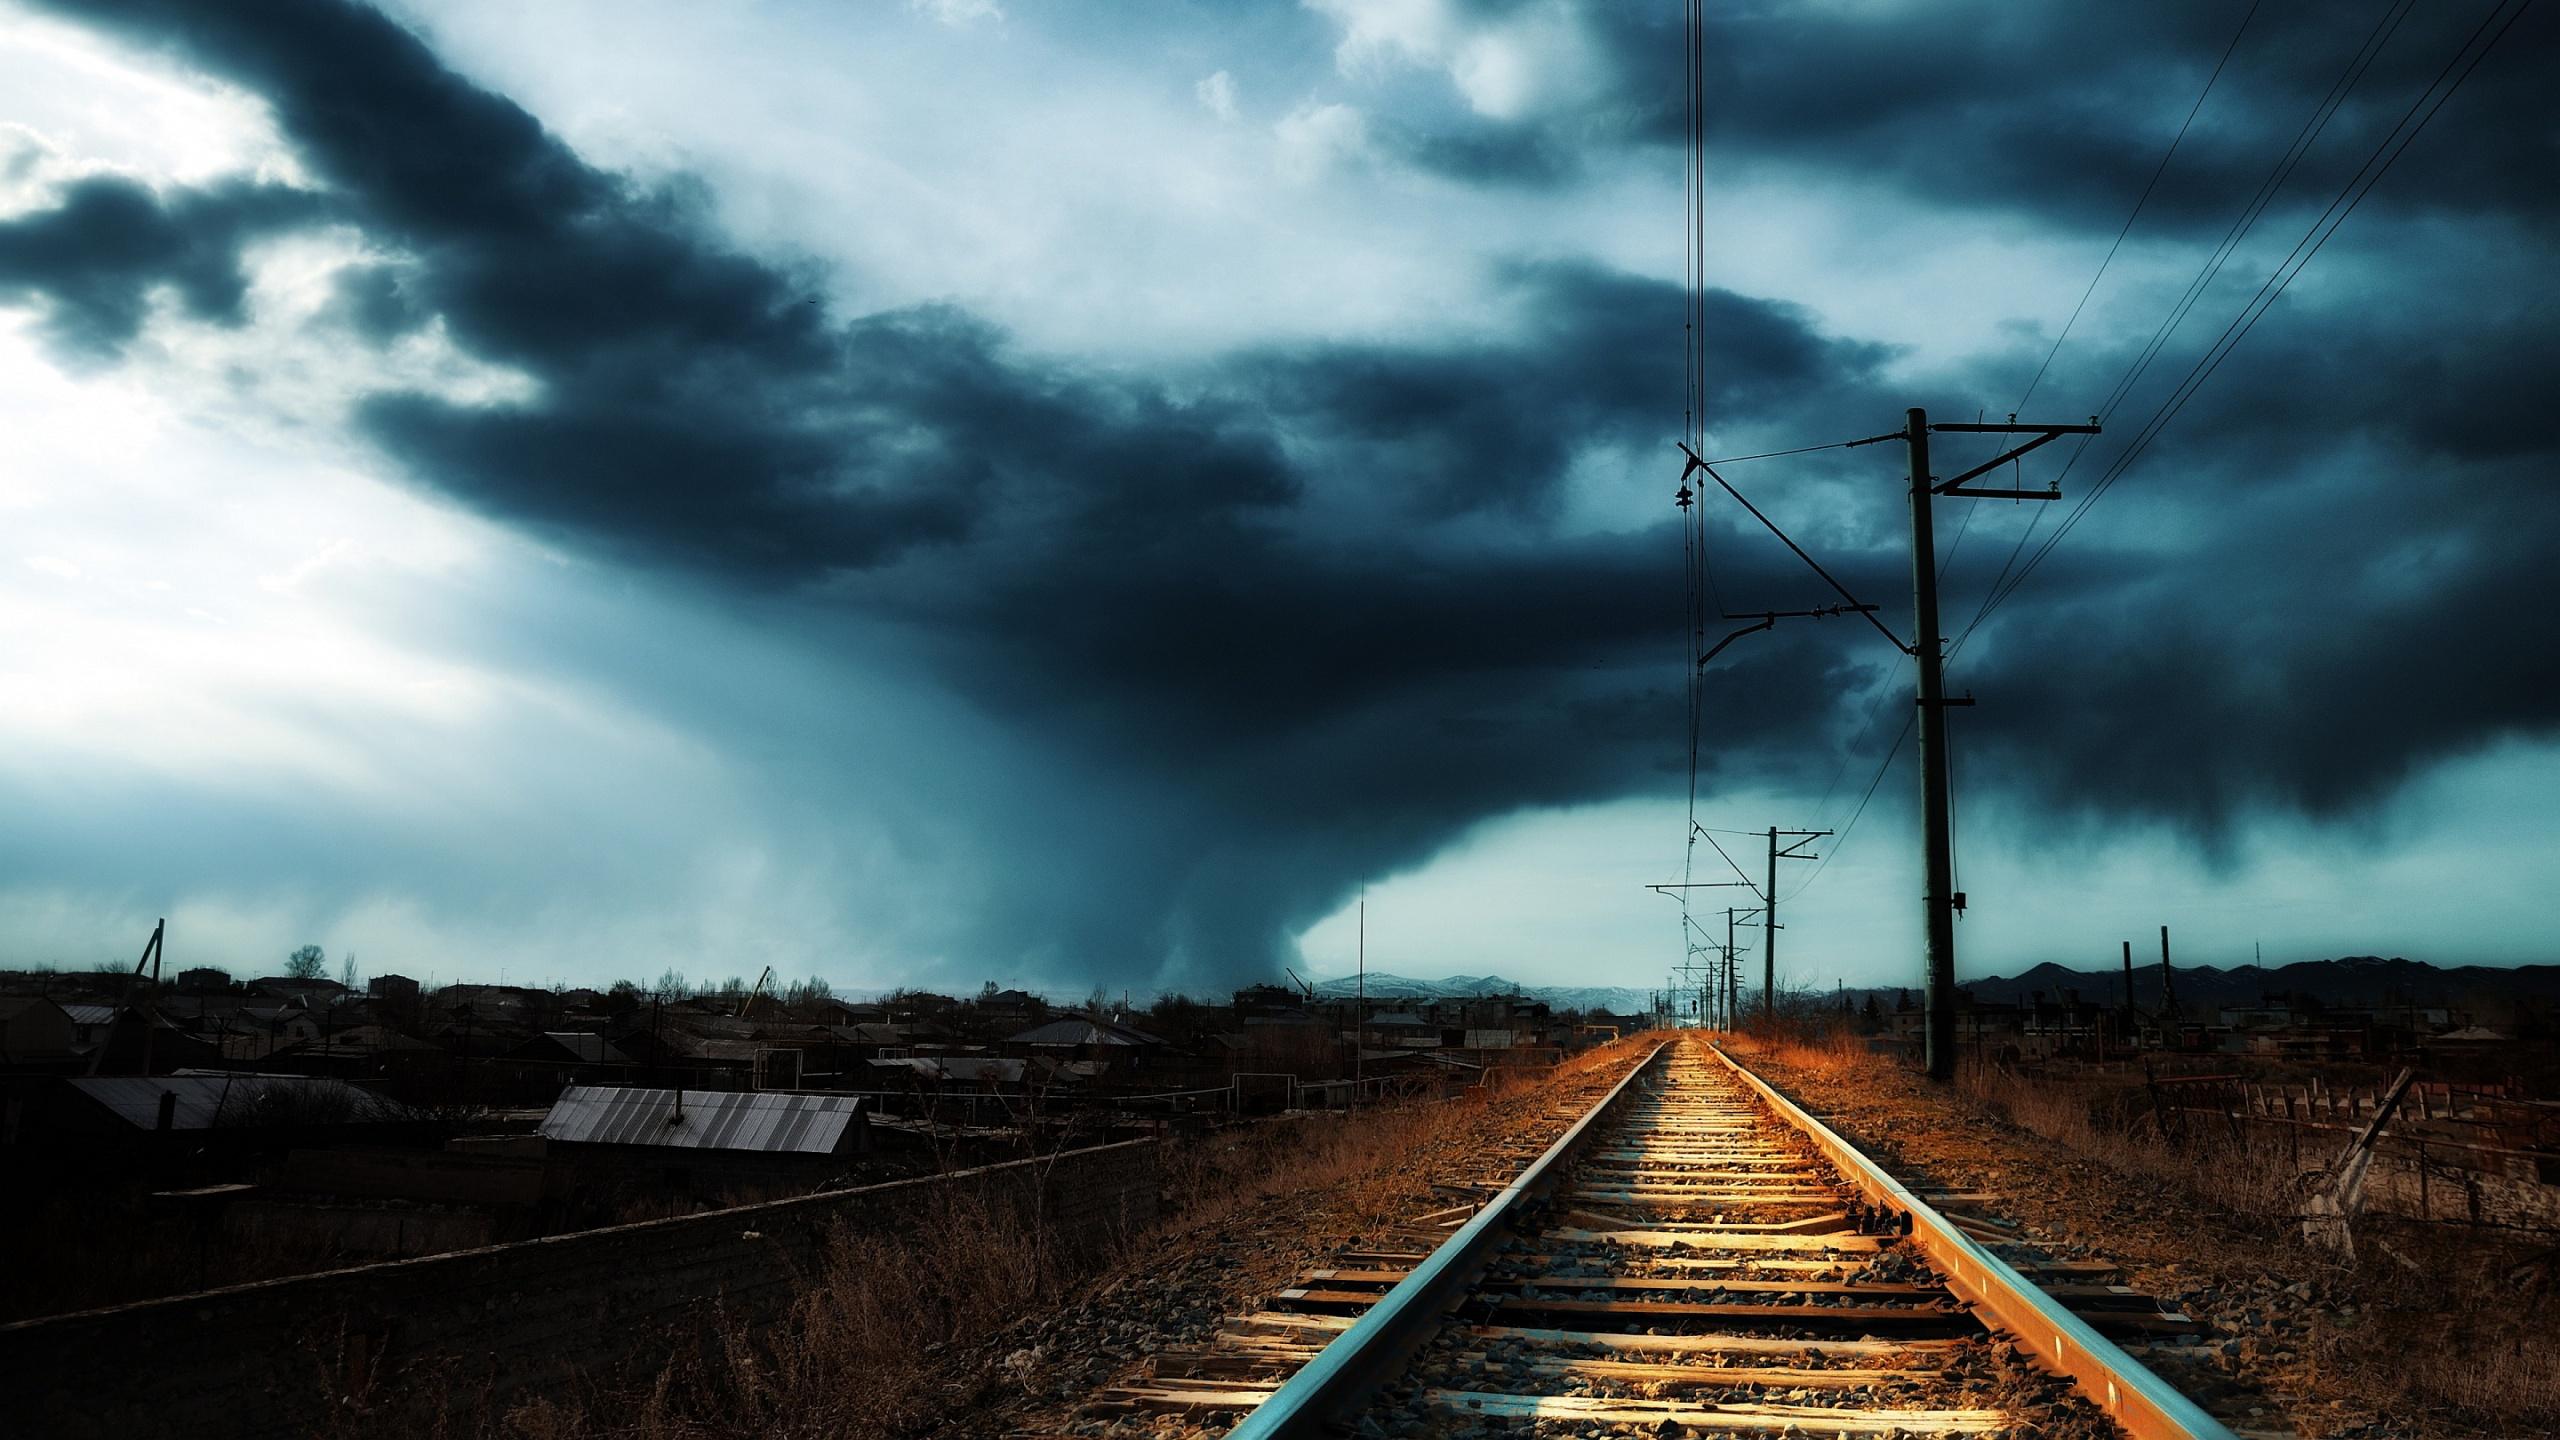 Railroad in armenia